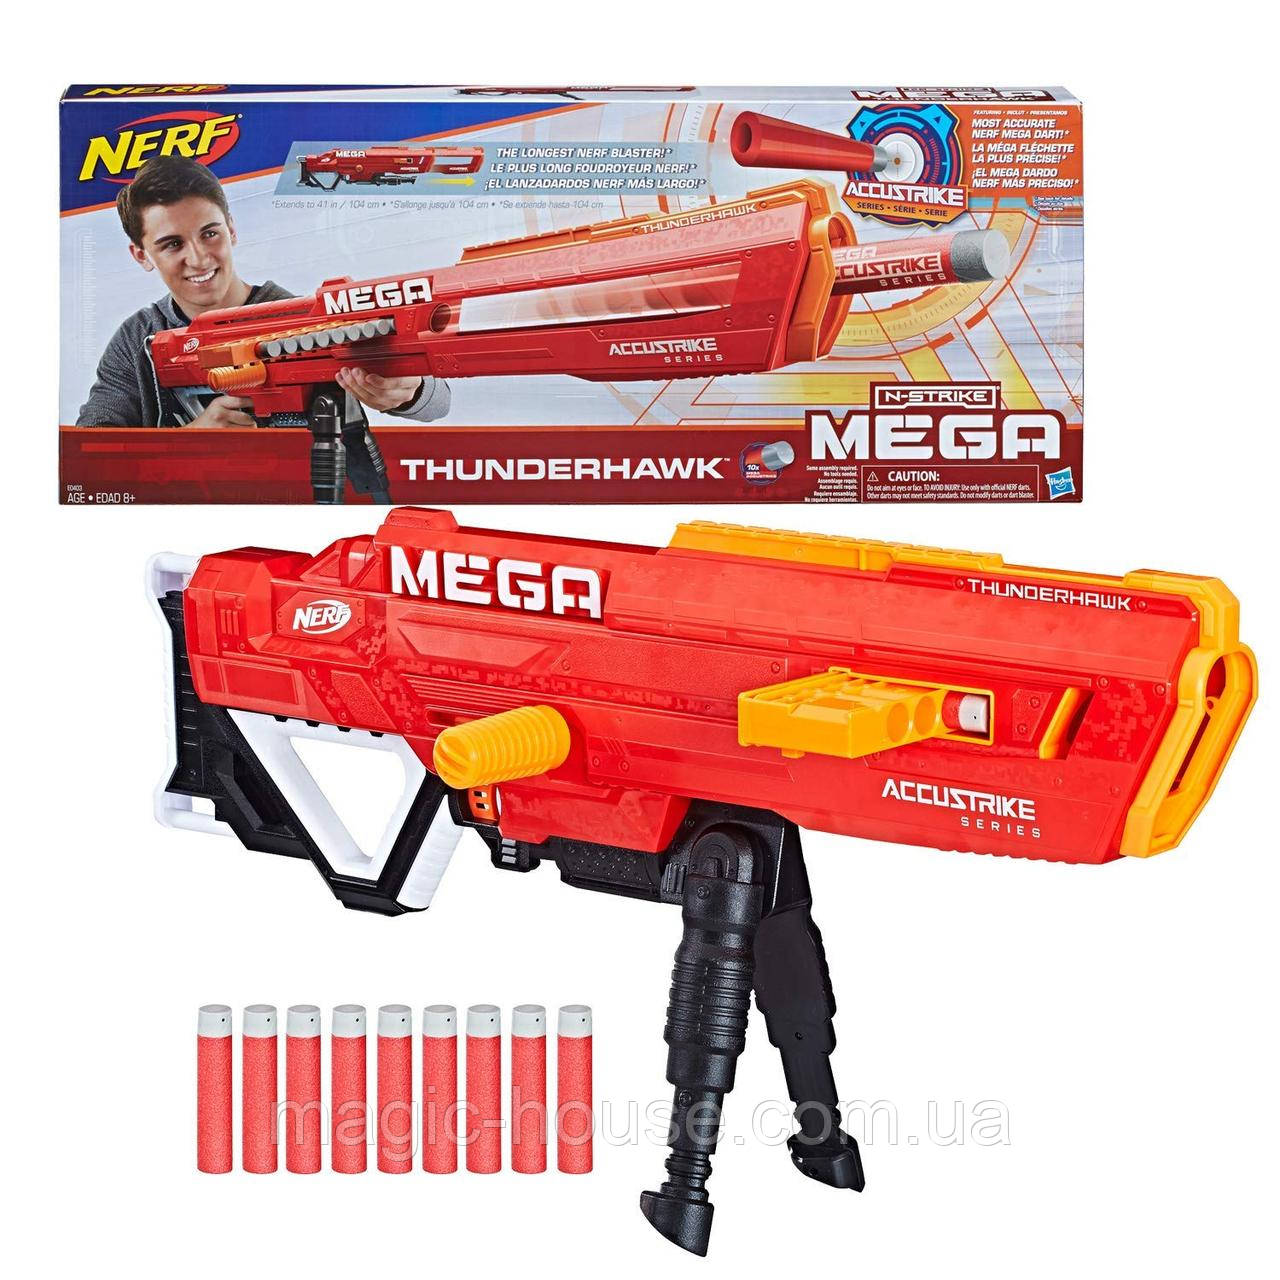 Бластер Нерф мега Тандерхок Комбат Thunderhawk Nerf AccuStrike Mega Toy Blaster E0403